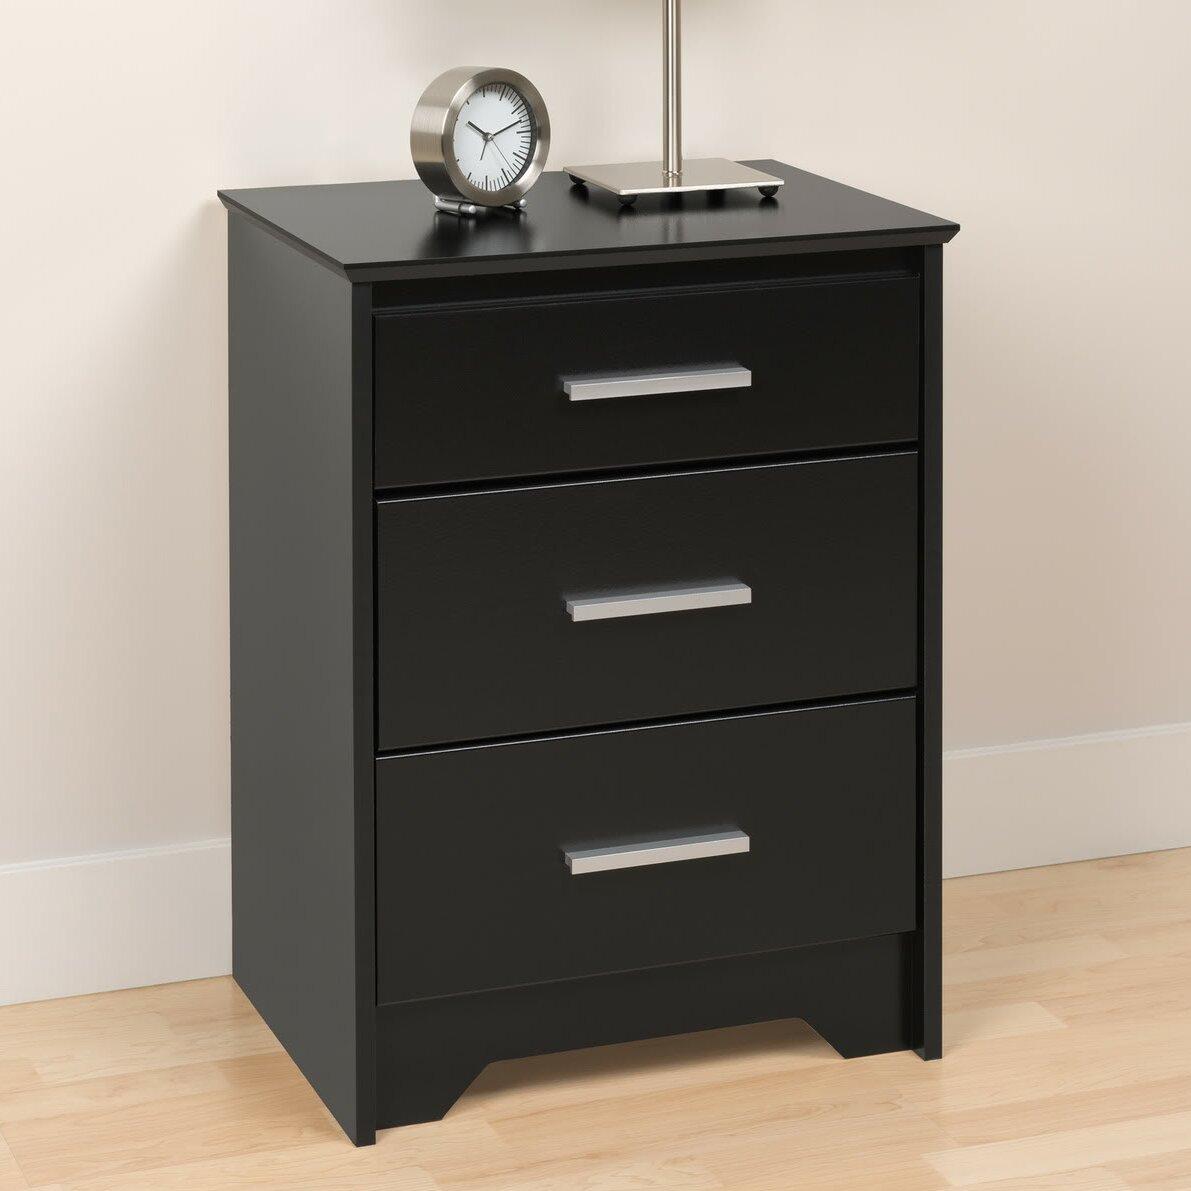 prepac coal harbor 3 drawer night stand reviews wayfair. Black Bedroom Furniture Sets. Home Design Ideas